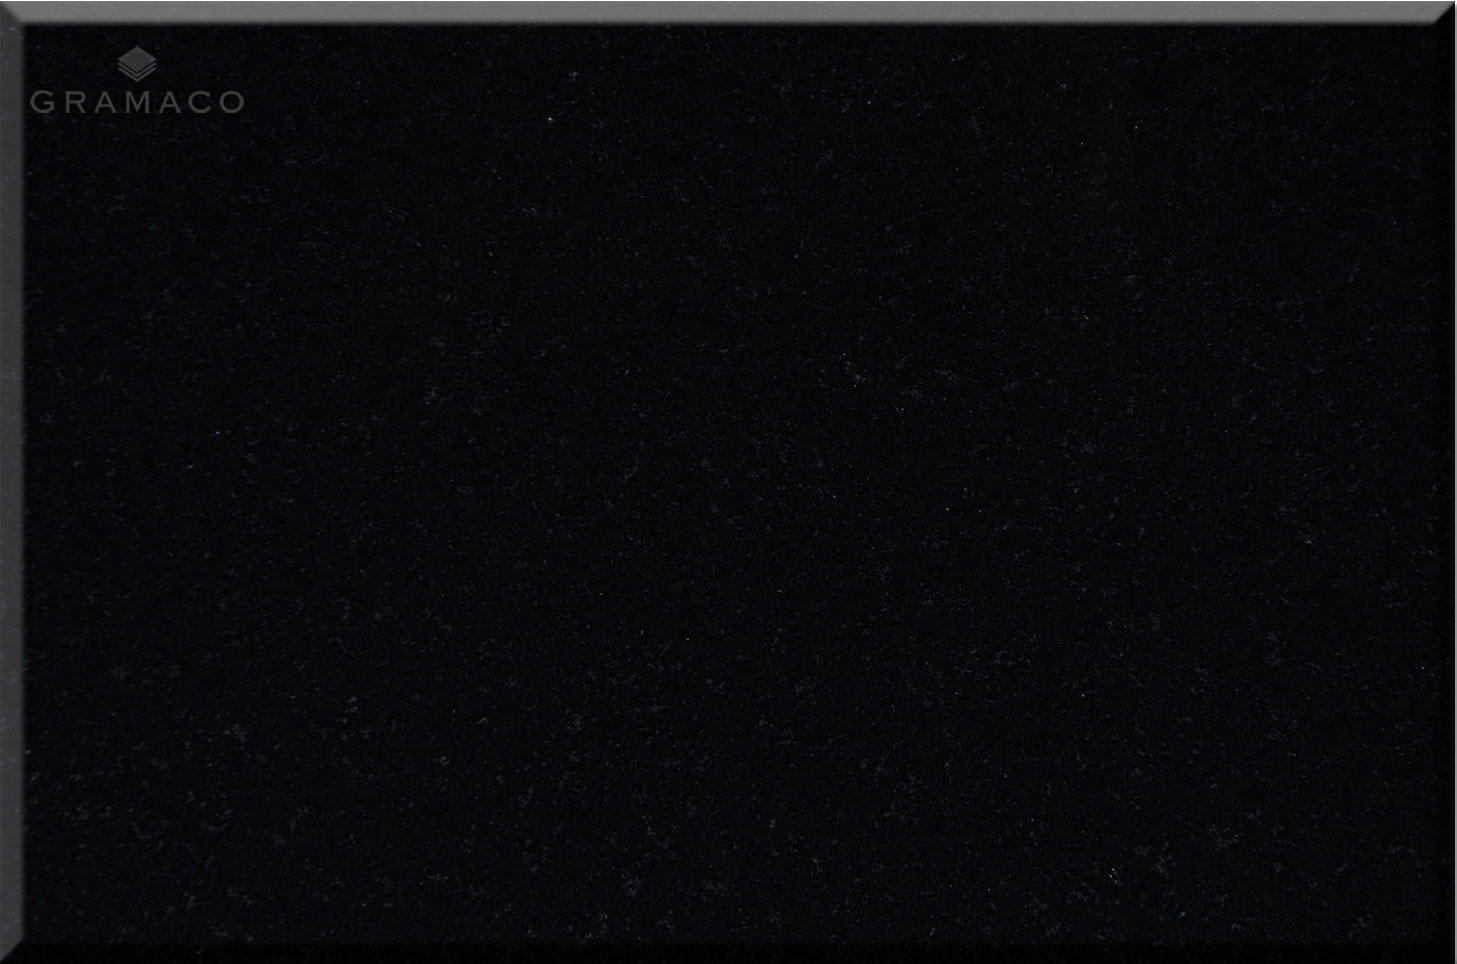 absolute black leather 5 gramaco. Black Bedroom Furniture Sets. Home Design Ideas